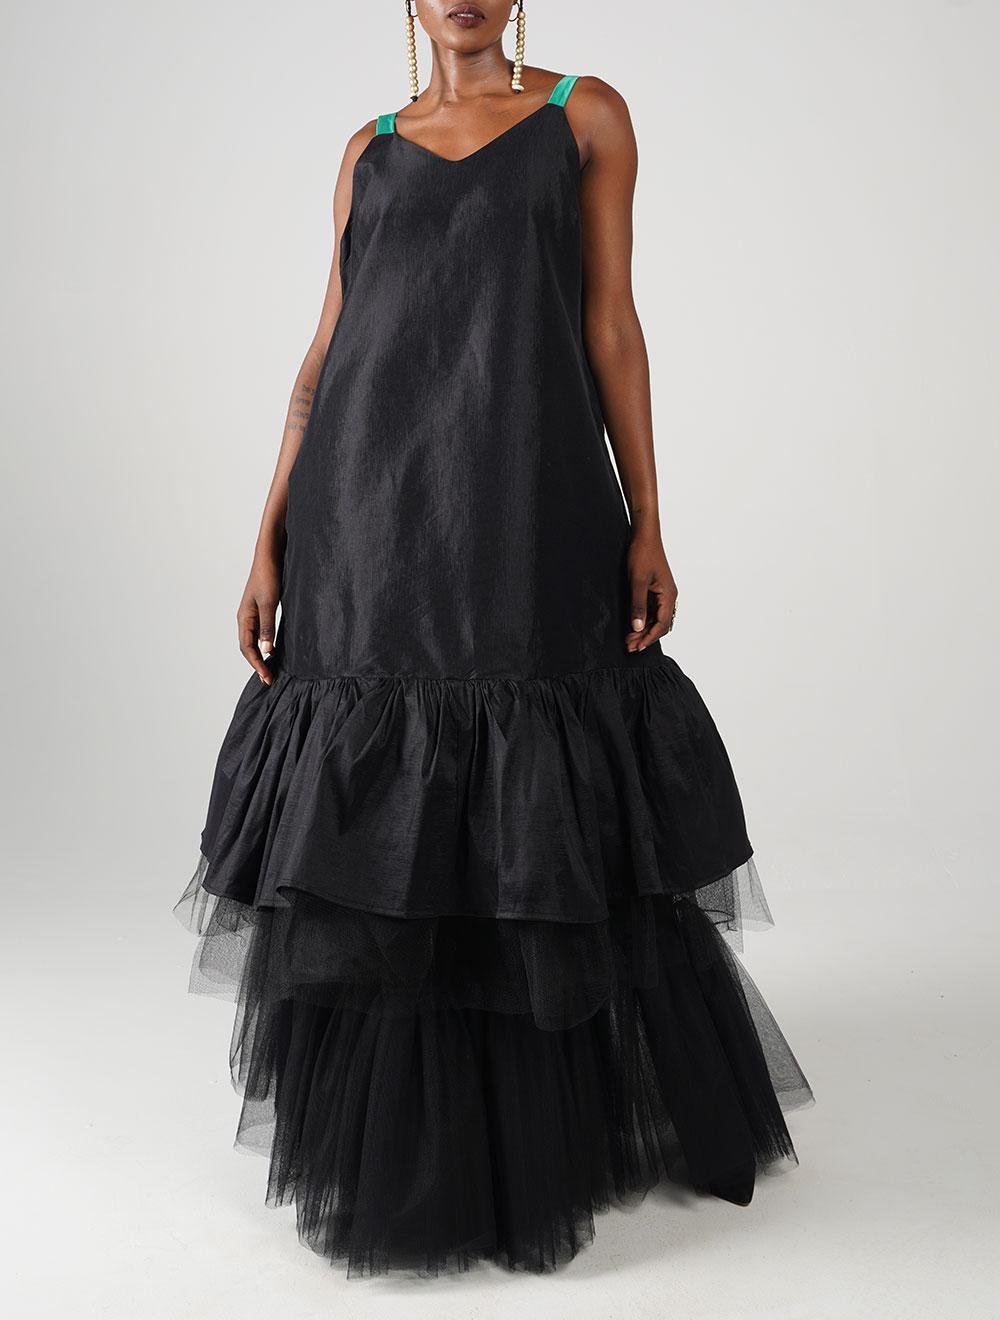 Etiaba Dress